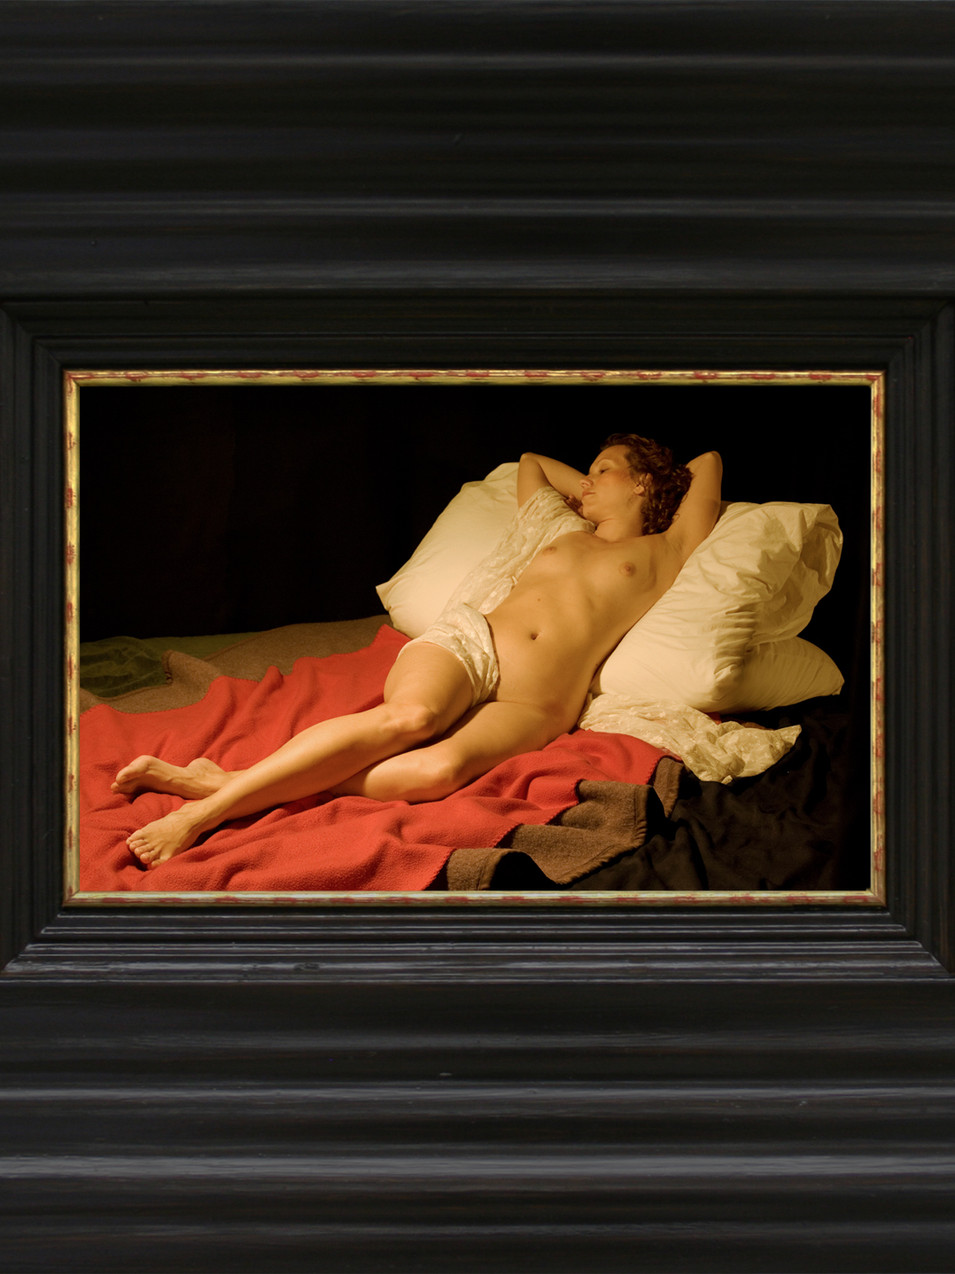 Anna Herrgott |Feat. Rubens - Anja as Angelika m.R. | 2008 | Fotografie | 32 cm x 38 cm Auflage 8